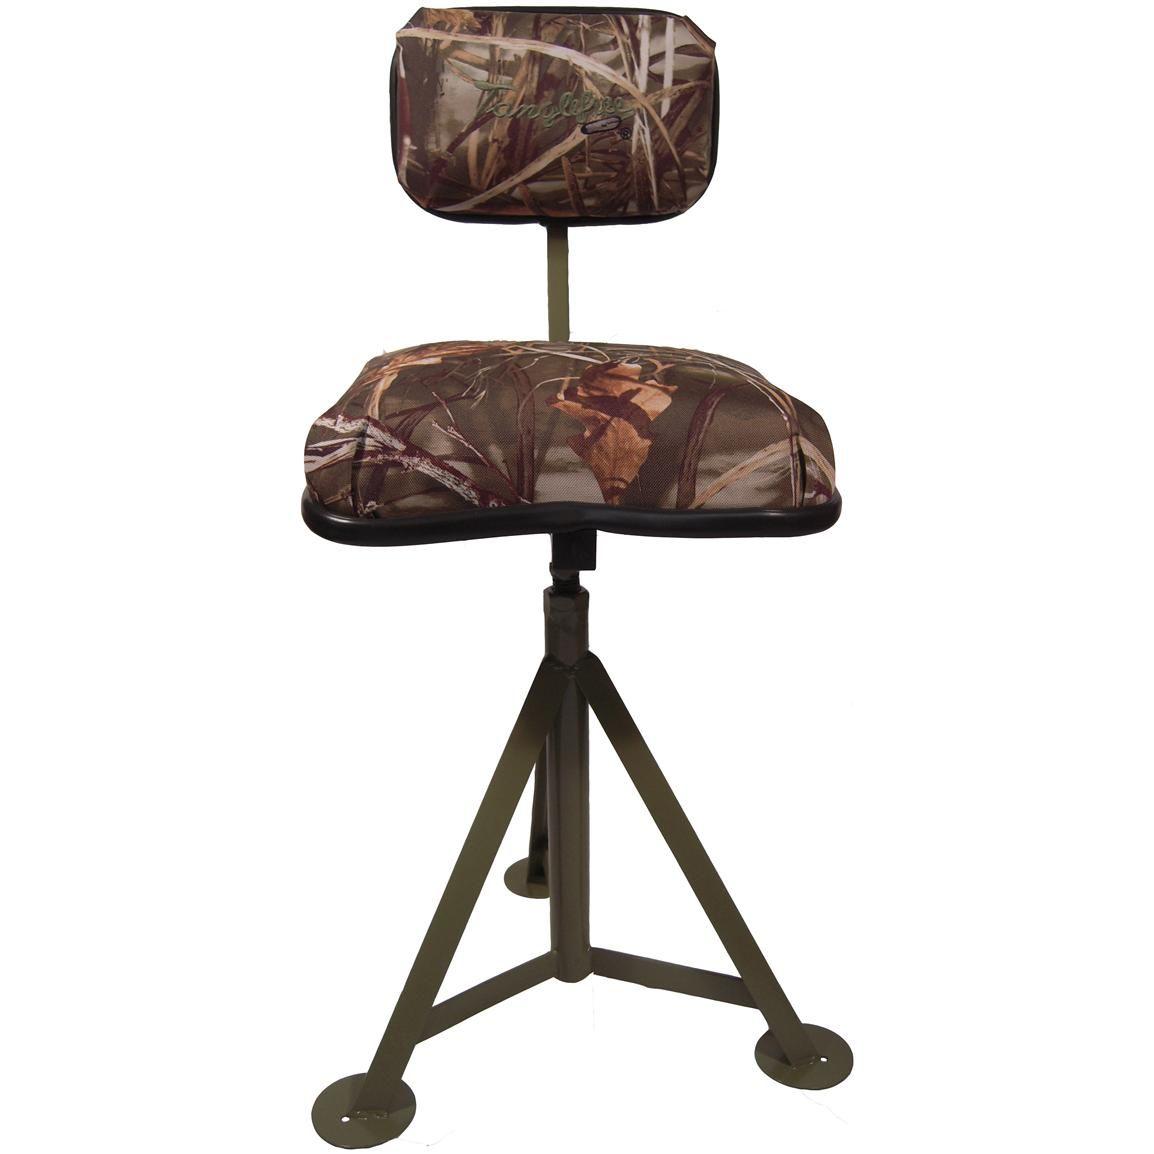 Adjustable hunting chair - Adjustable Hunting Chair